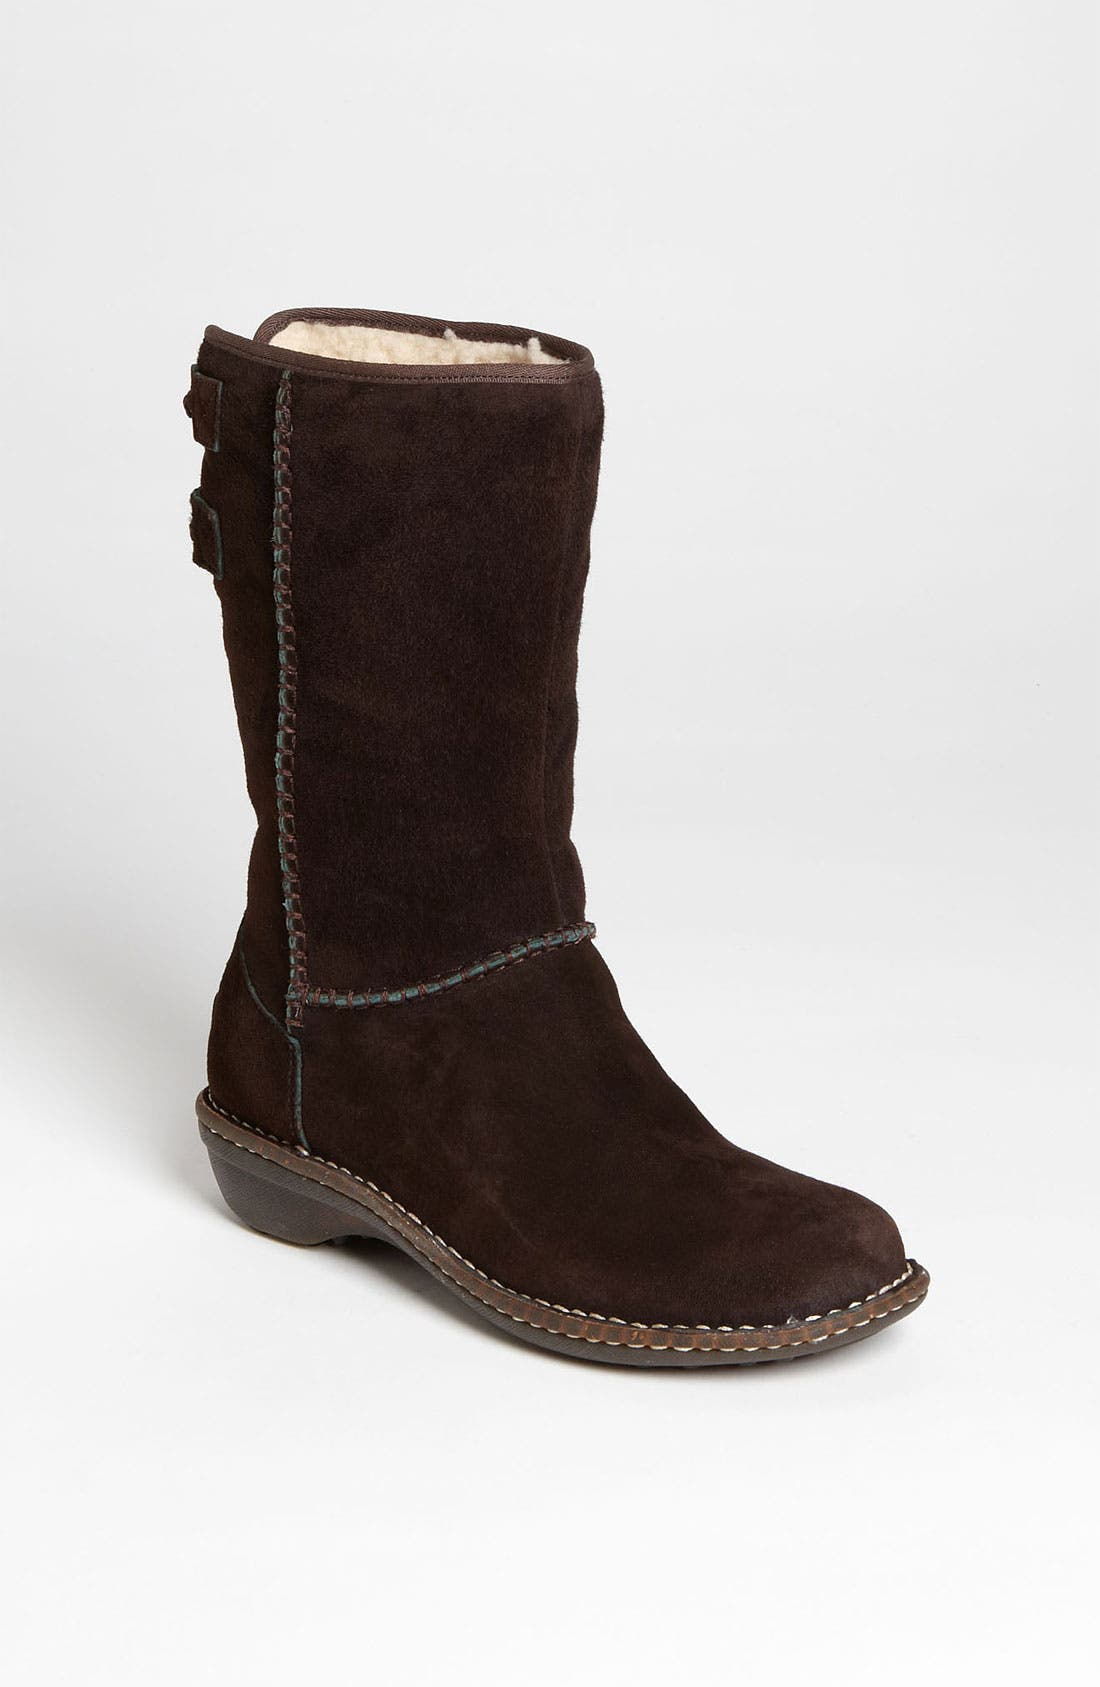 Alternate Image 1 Selected - UGG® Australia 'Haywell' Boot (Women)